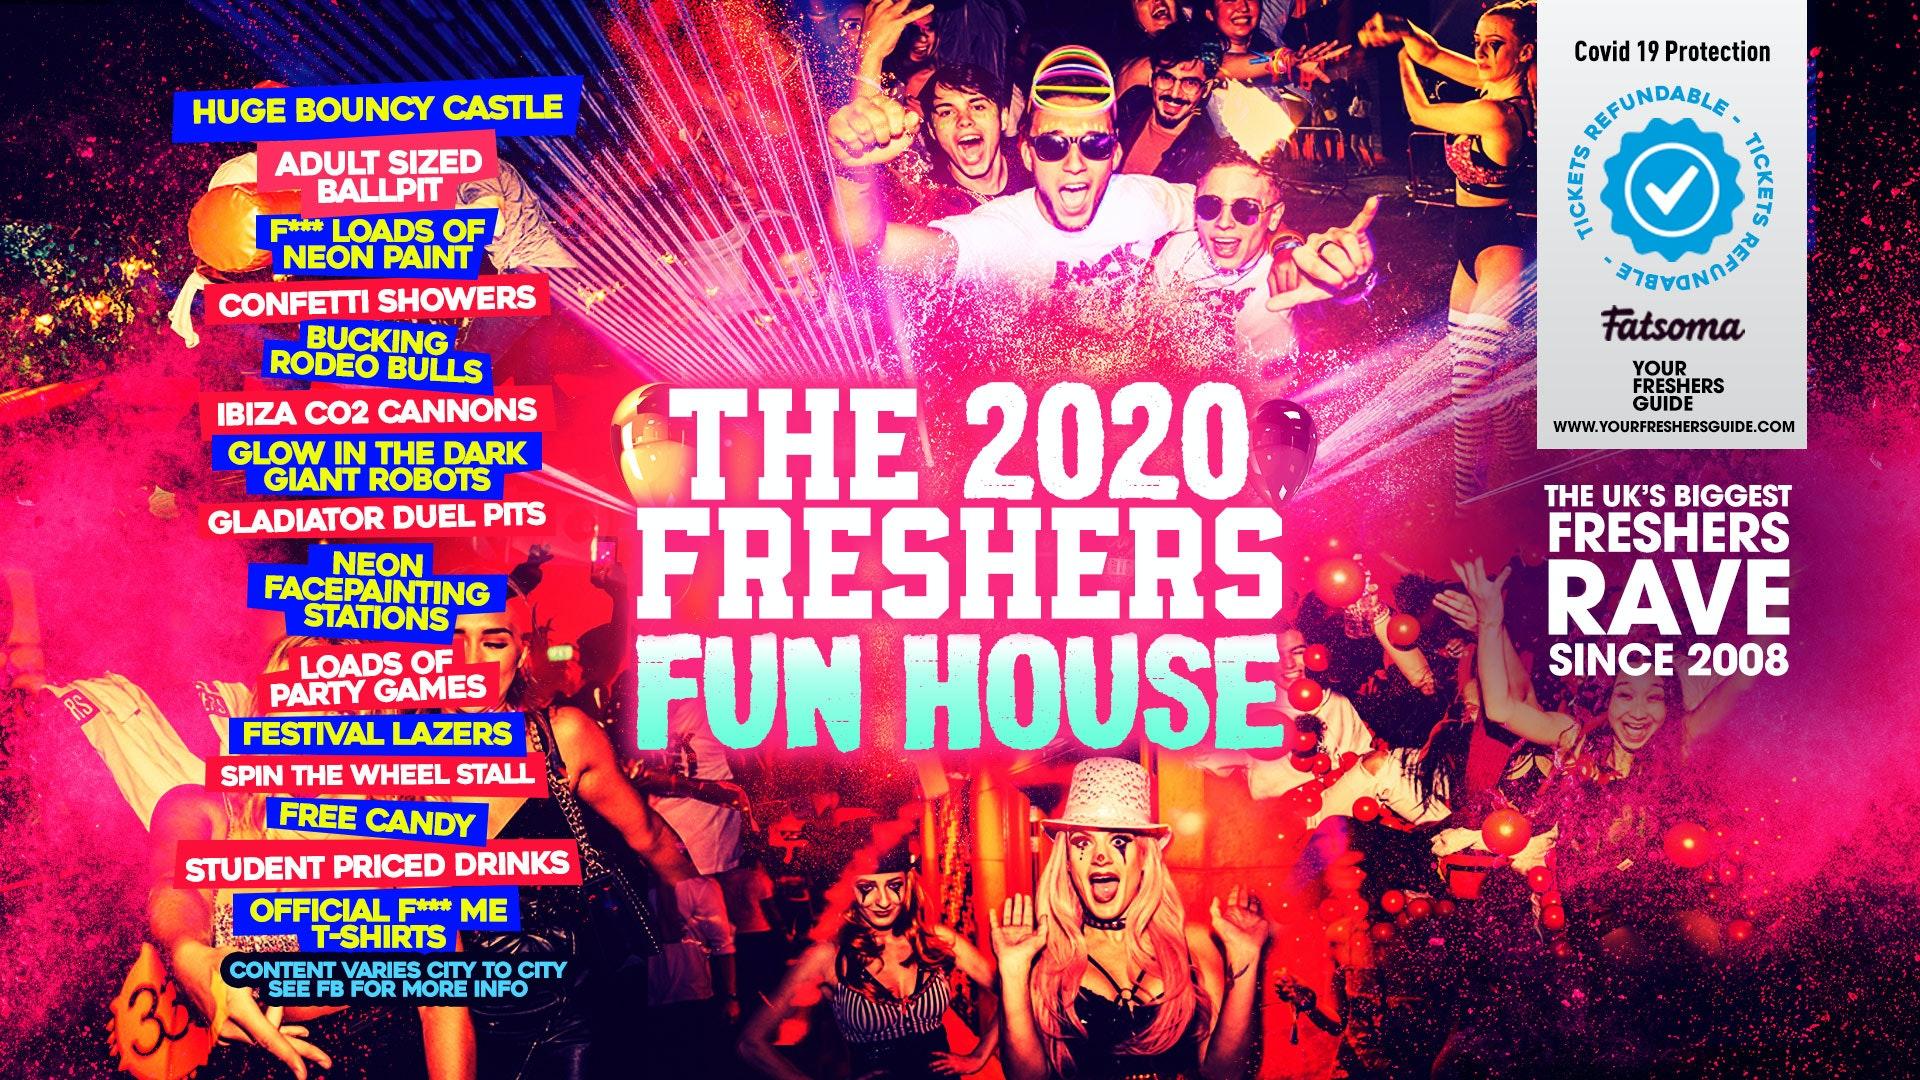 Freshers Fun House // Manchester Freshers 2020